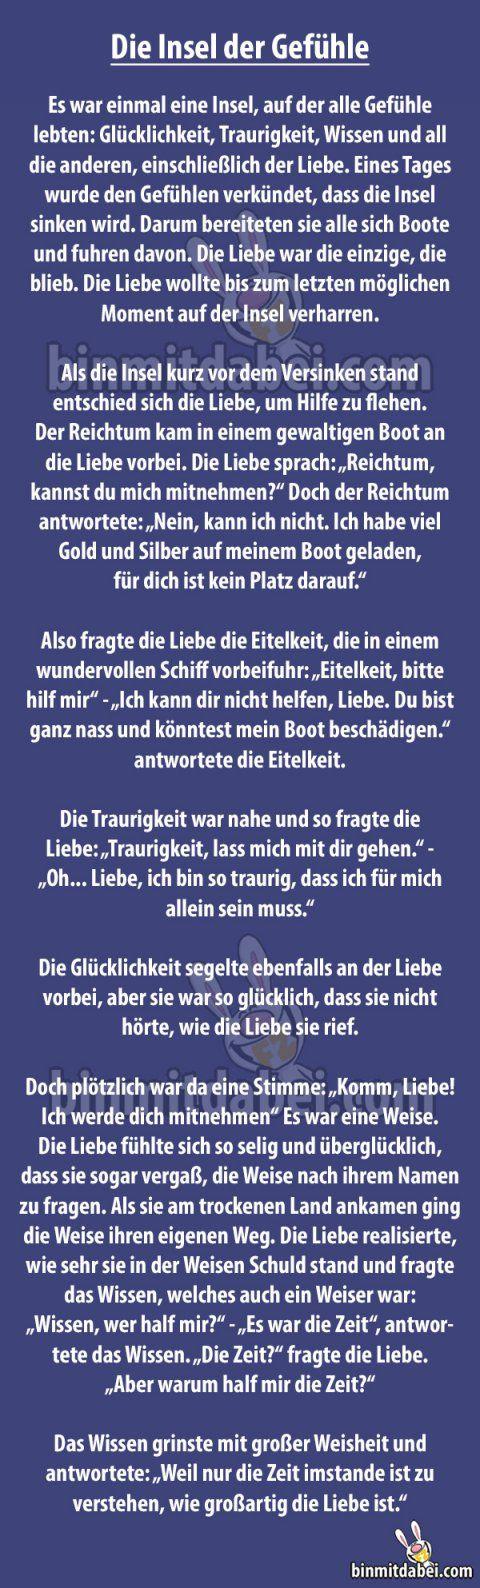 Binmitdabei Com German Quotes Words Quotes